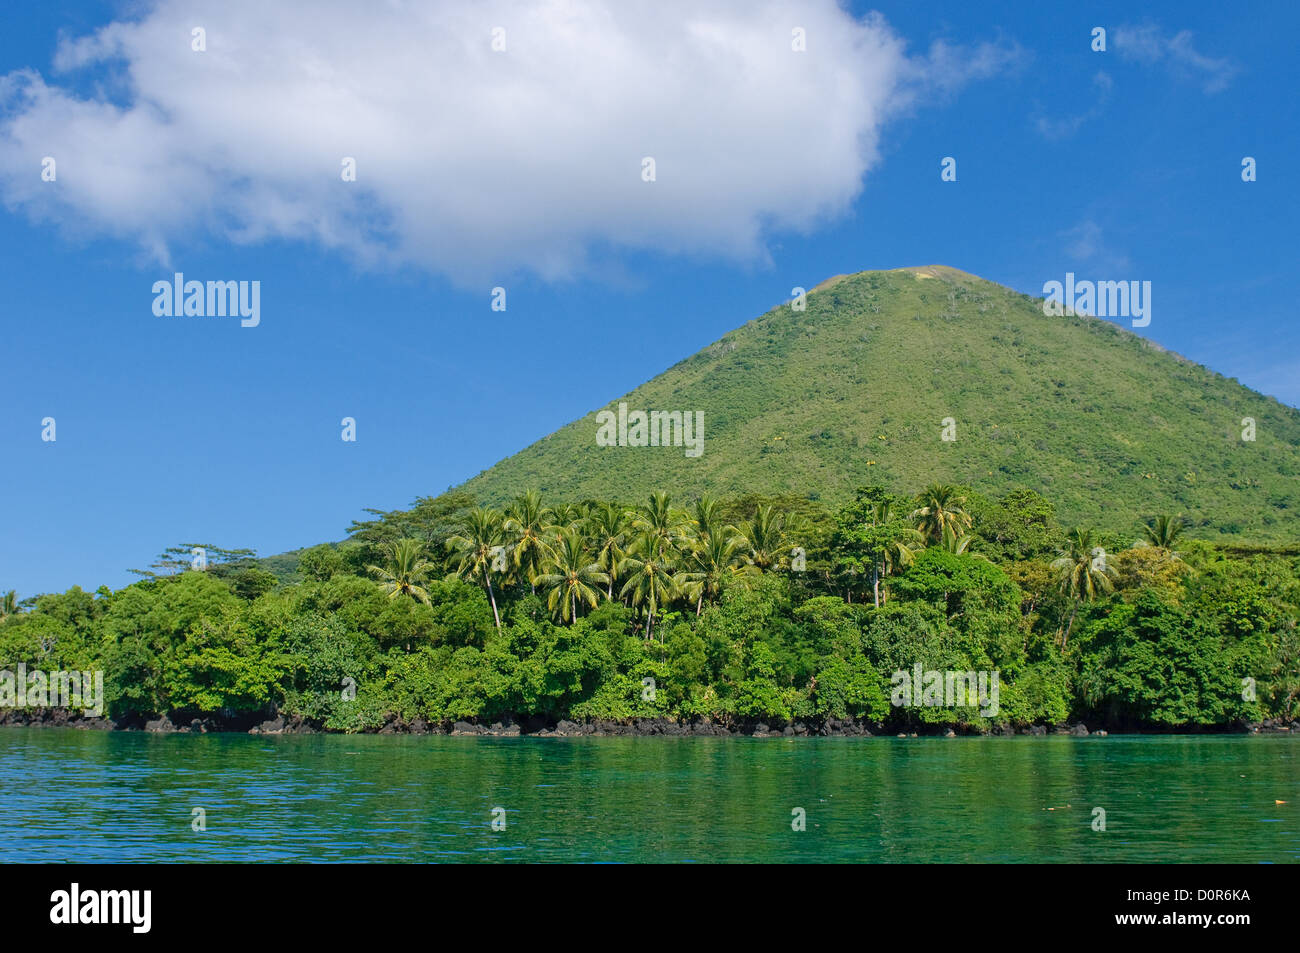 Gunung Api volcano, Banda islands, Indonesia - Stock Image